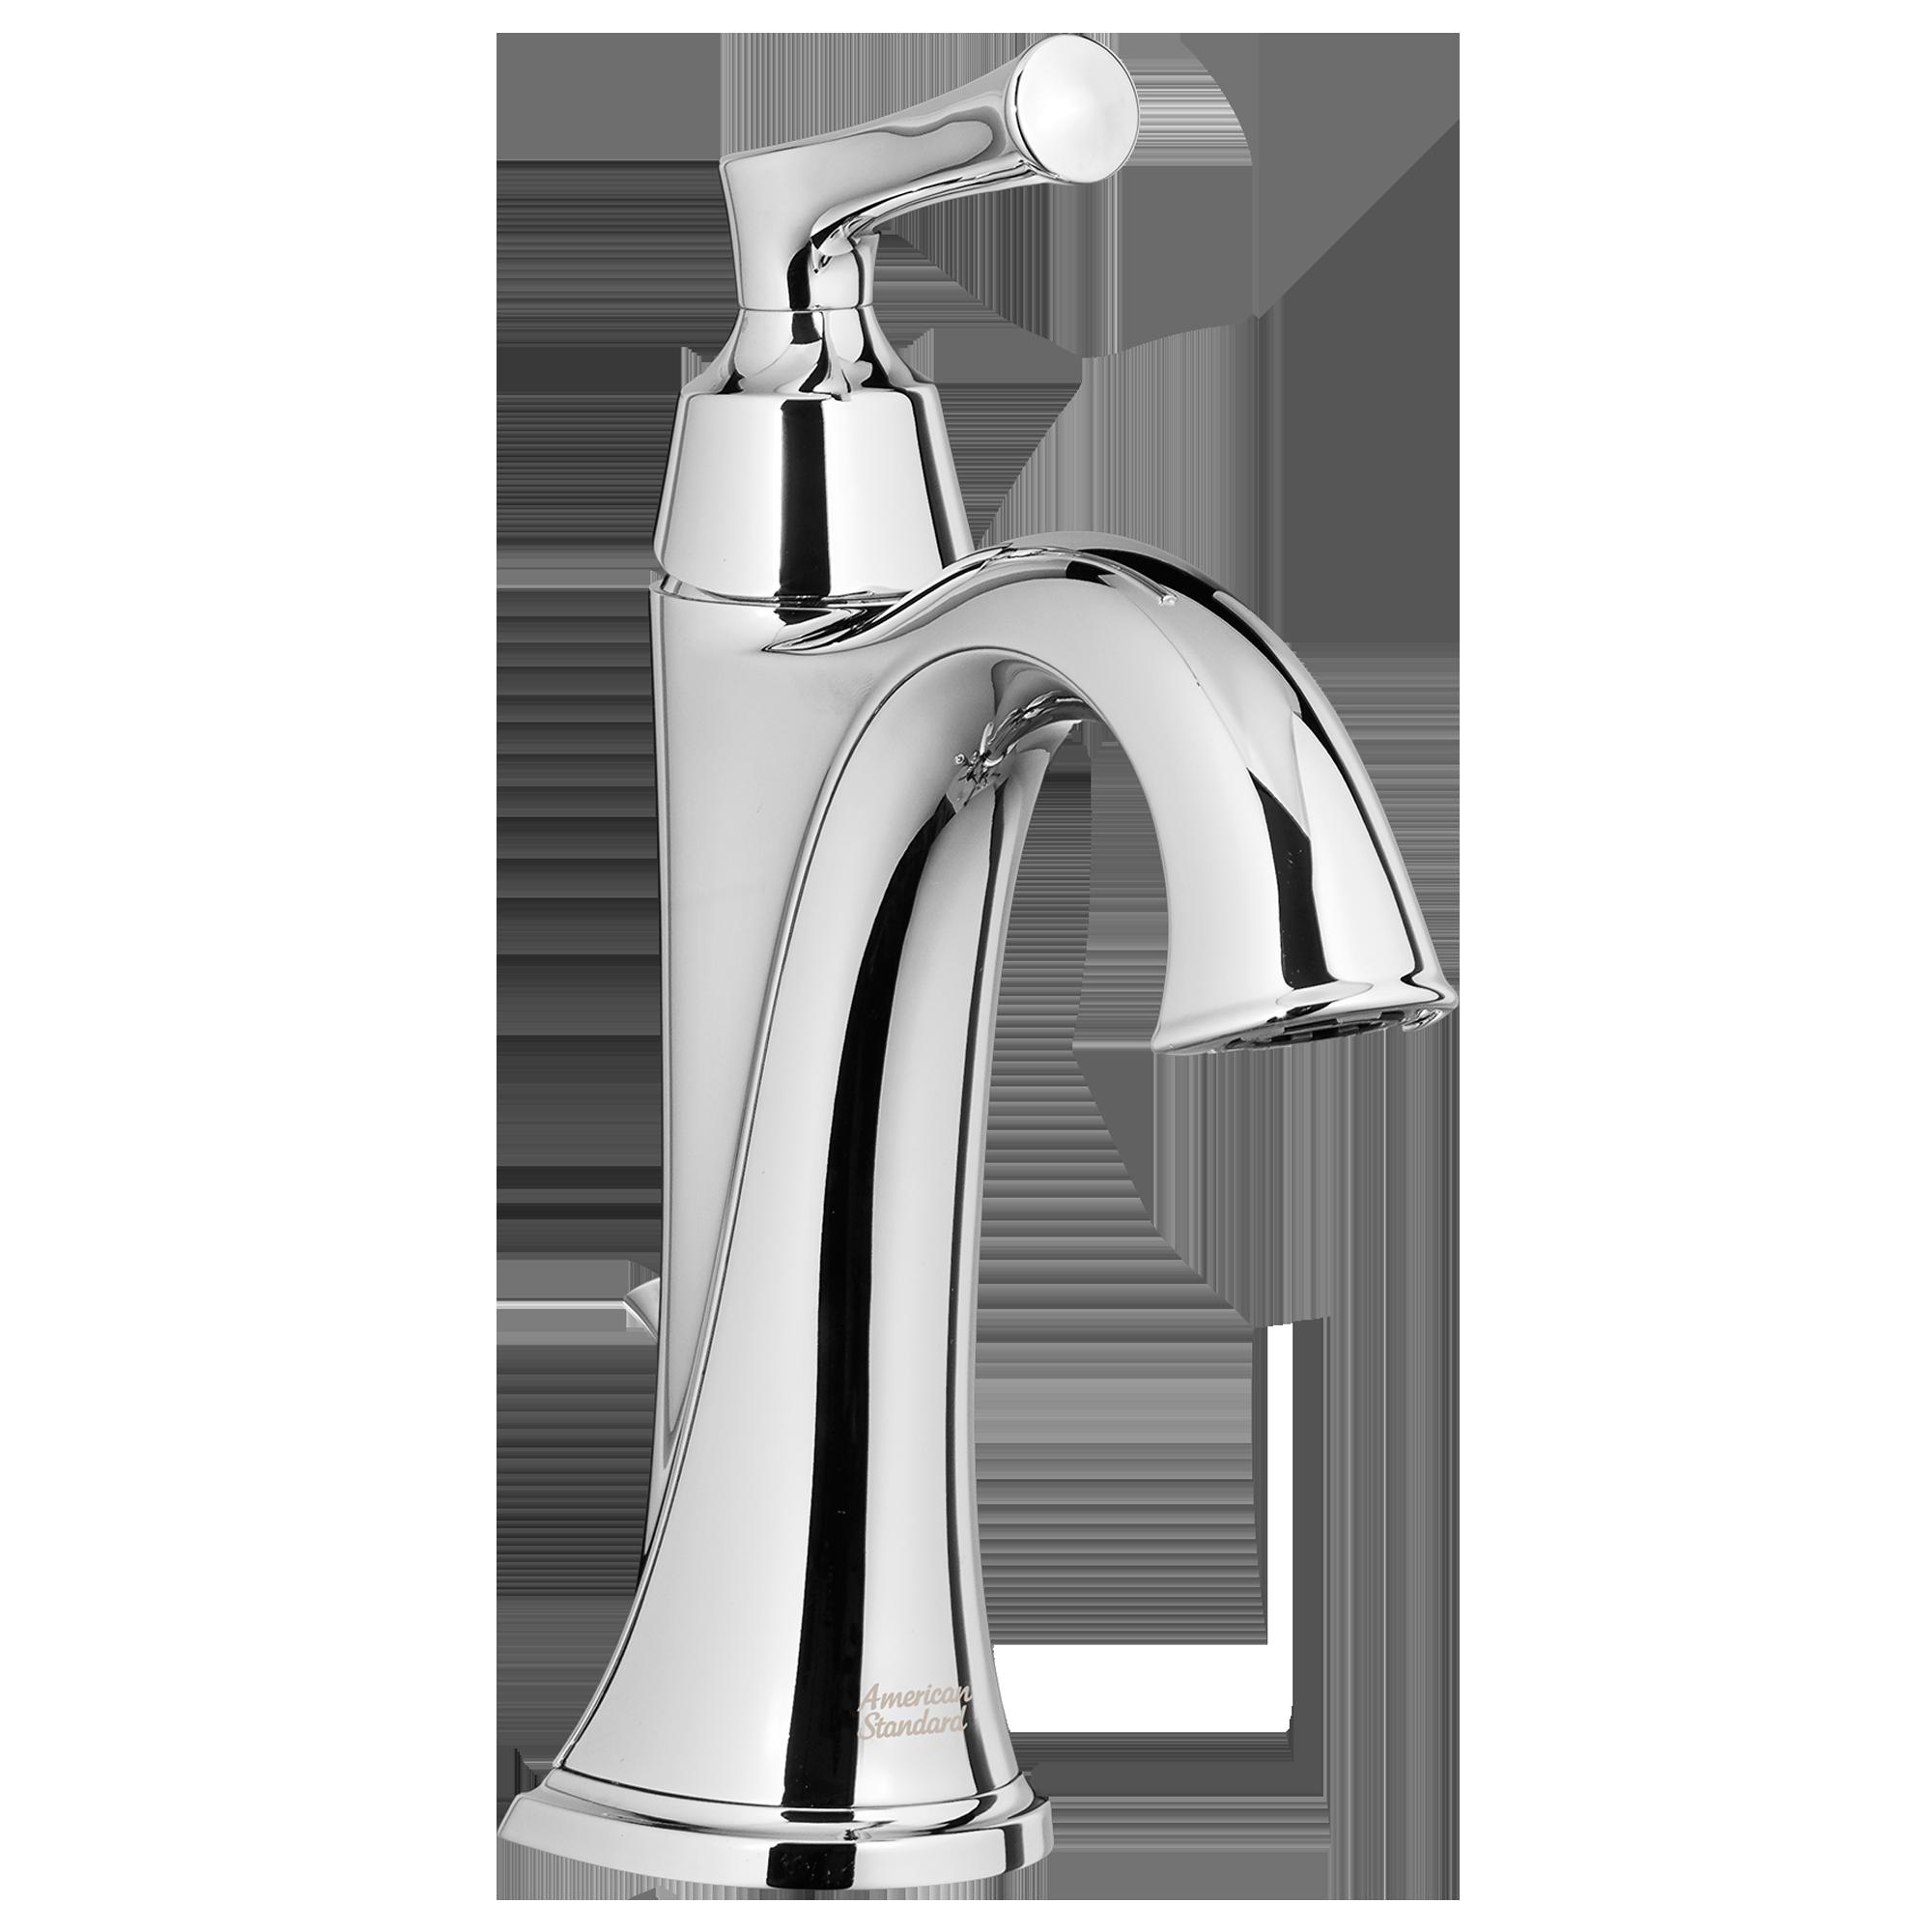 Estate Single Handle Bathroom Sink Faucet American Standard Single Hole Bathroom Faucet Bathroom Faucets Bathroom Sink Faucets